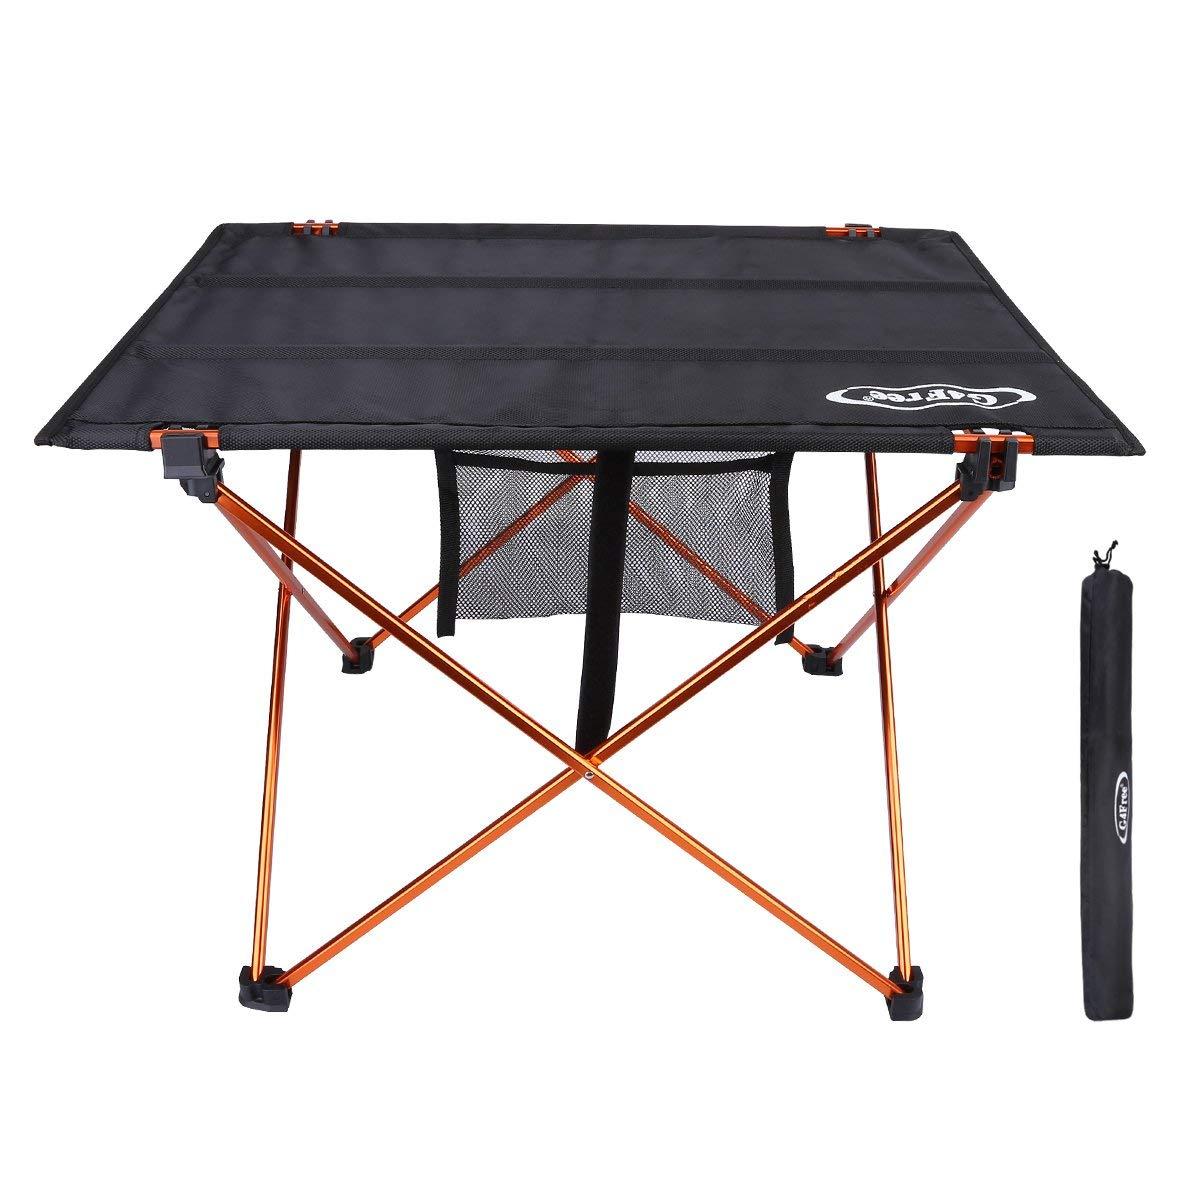 G4Free Ultra-Light Portable Walmart Folding Table